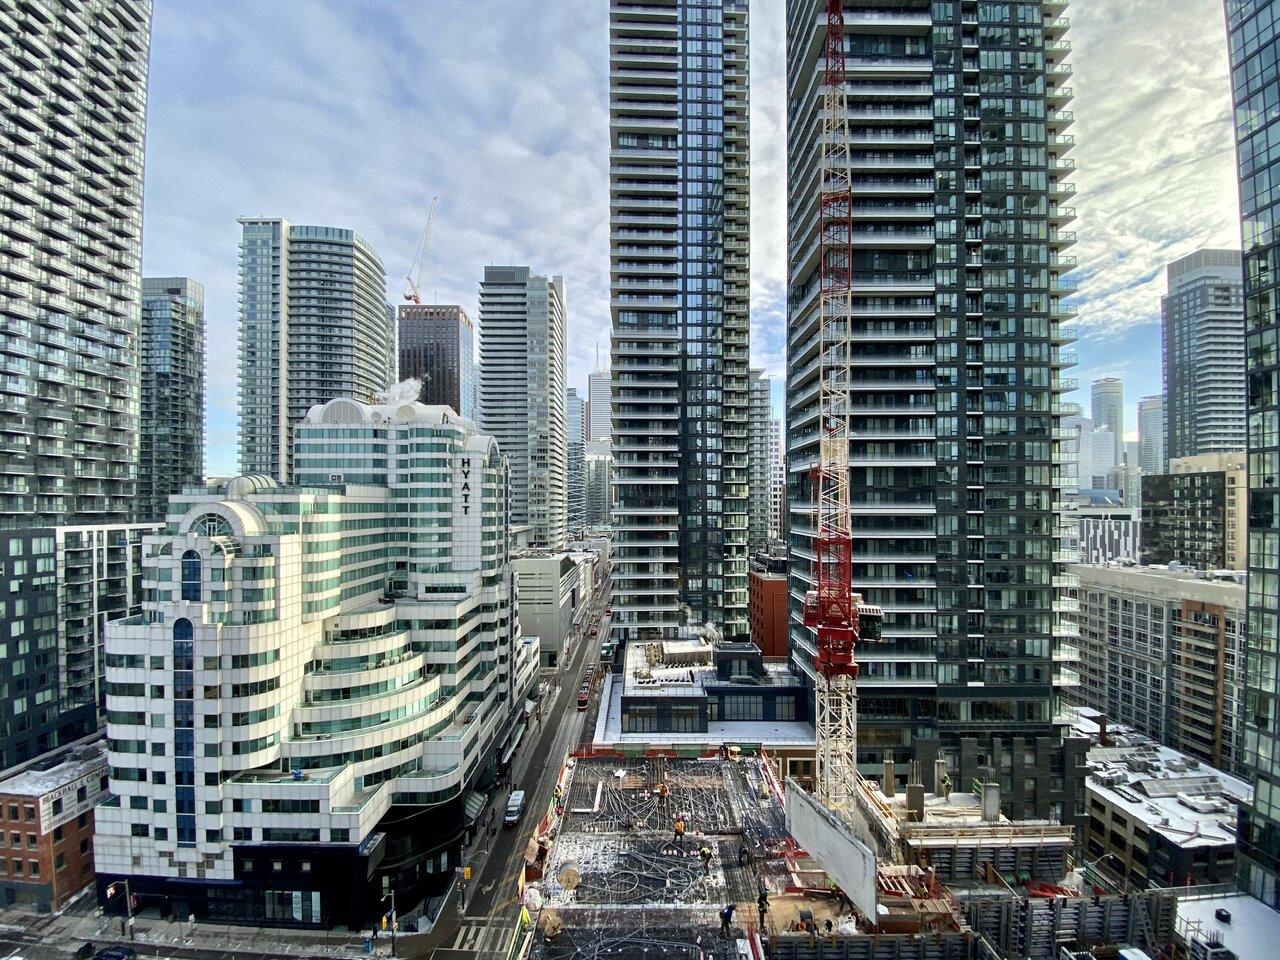 Daily Photo, Toronto, Entertainment District, 357 King West